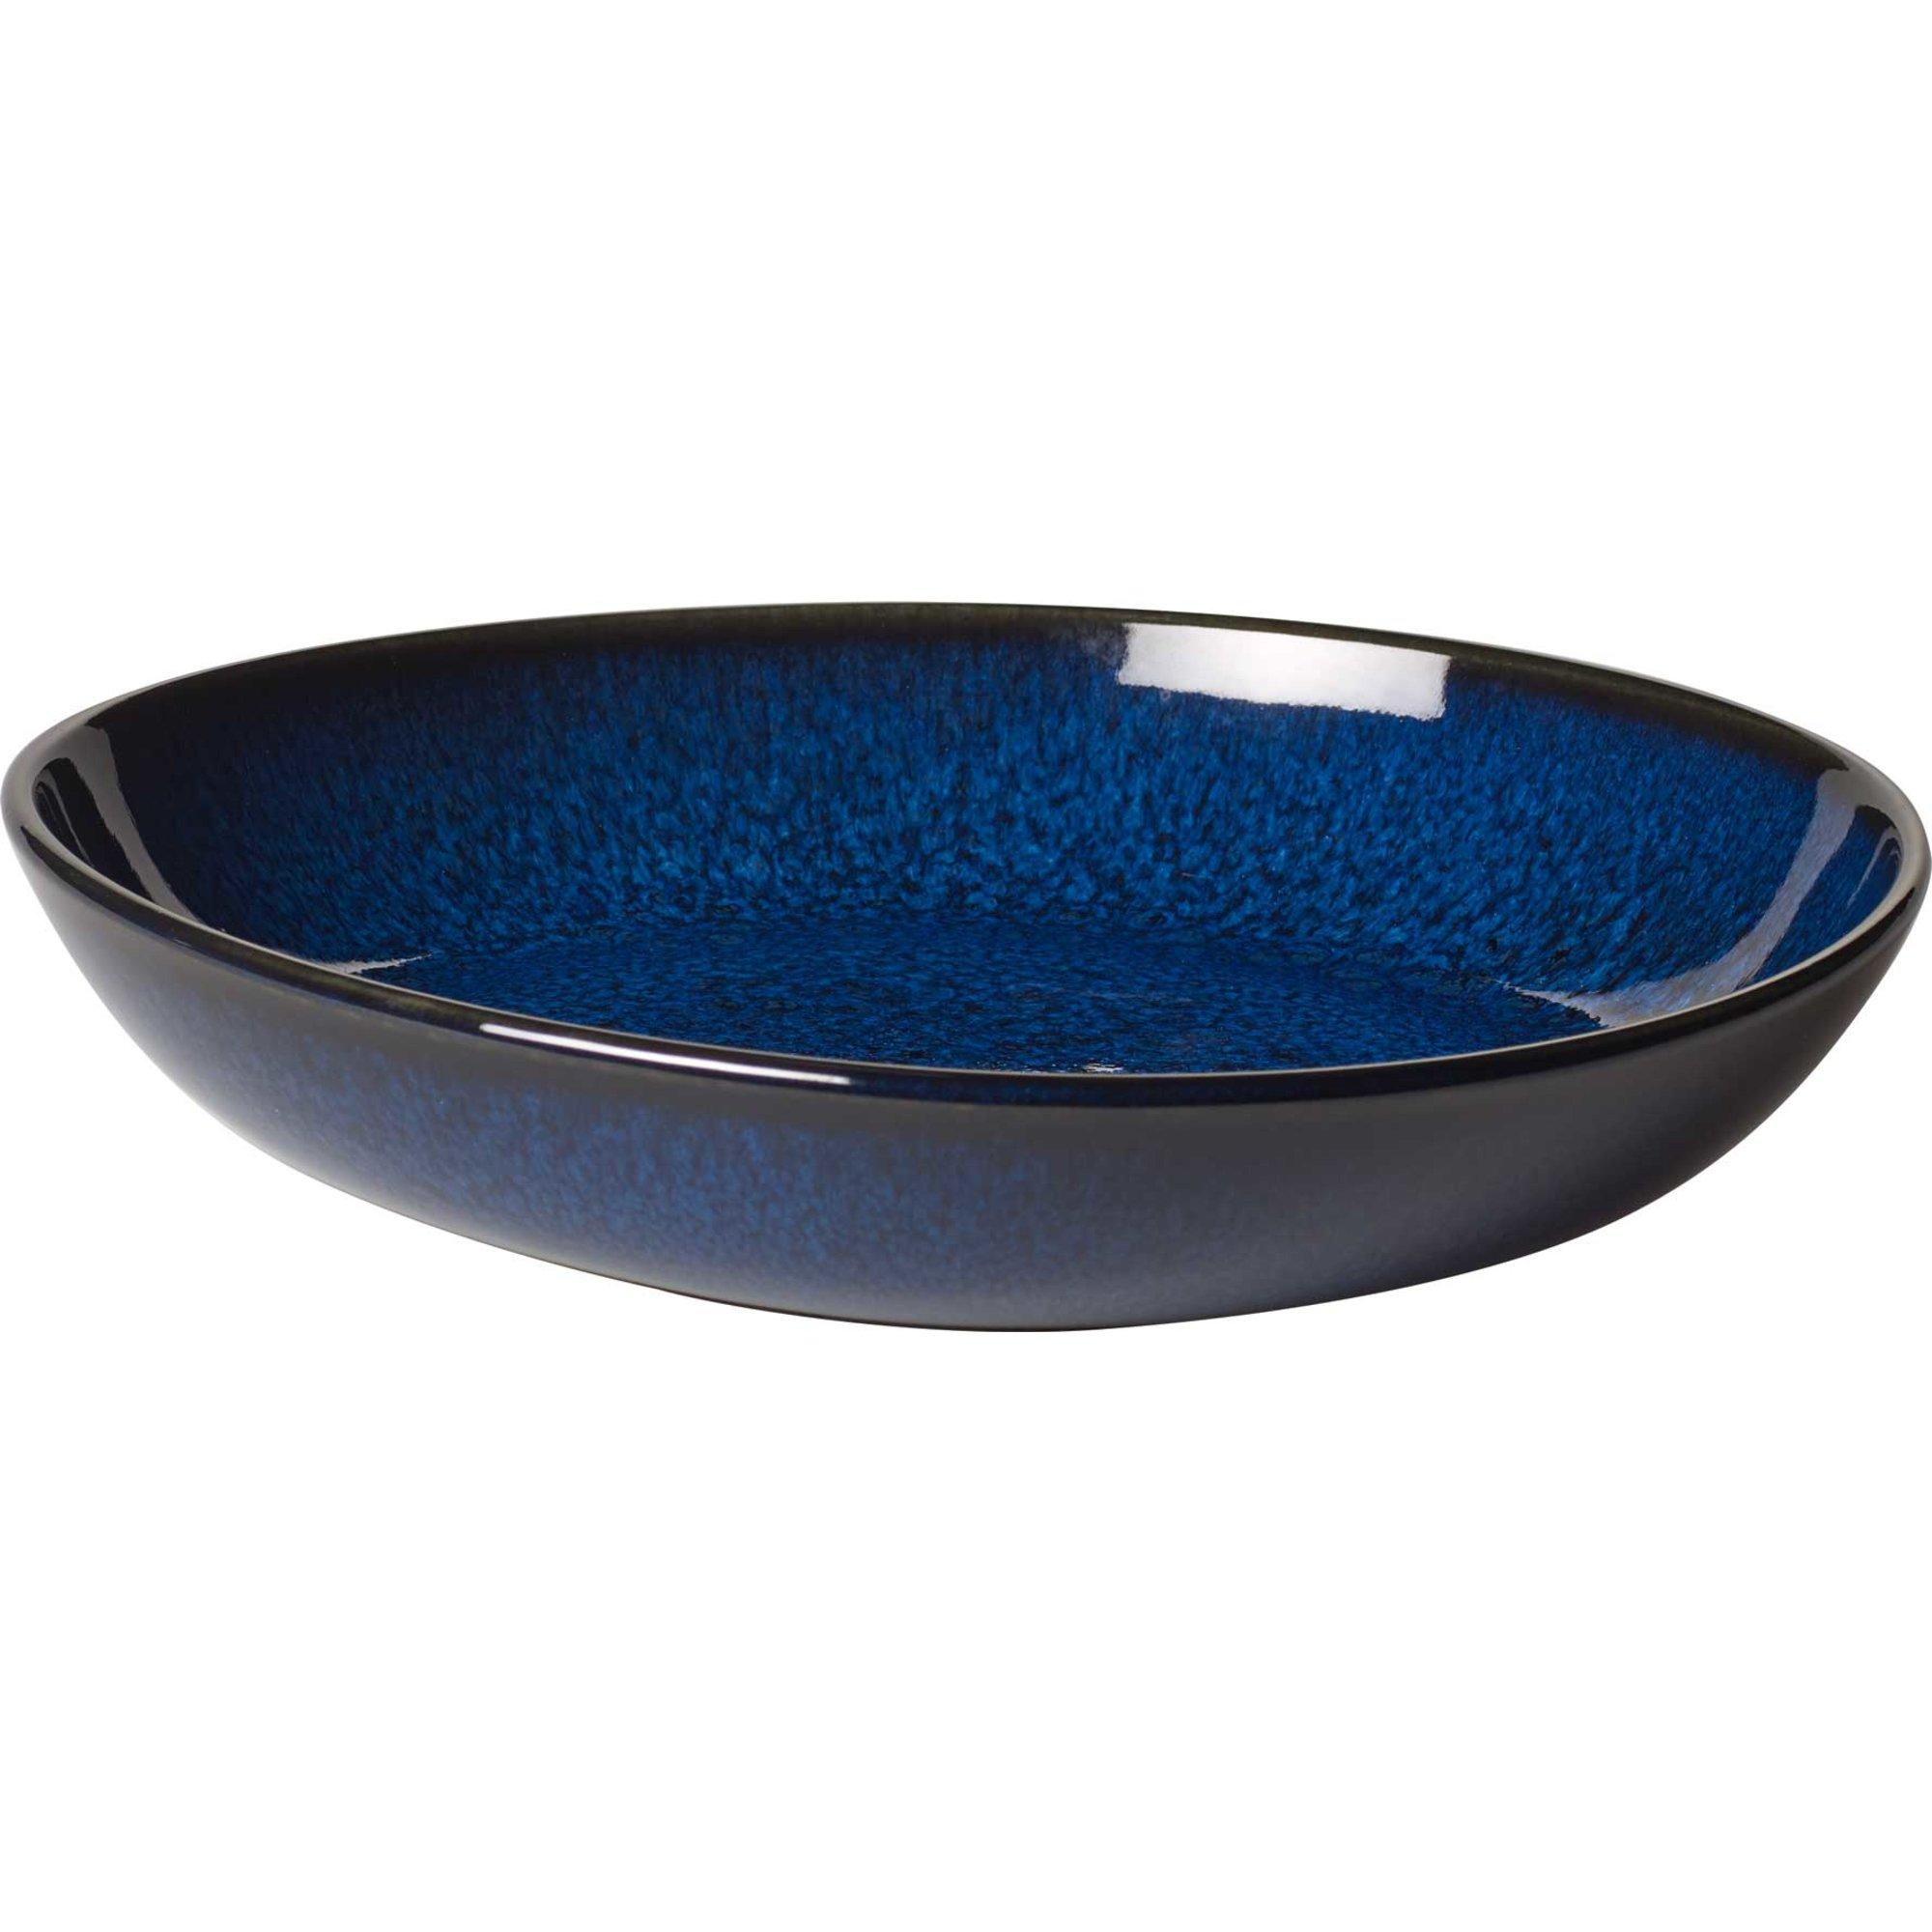 Villeroy & Boch Lave Bleu Djuptallrik Liten